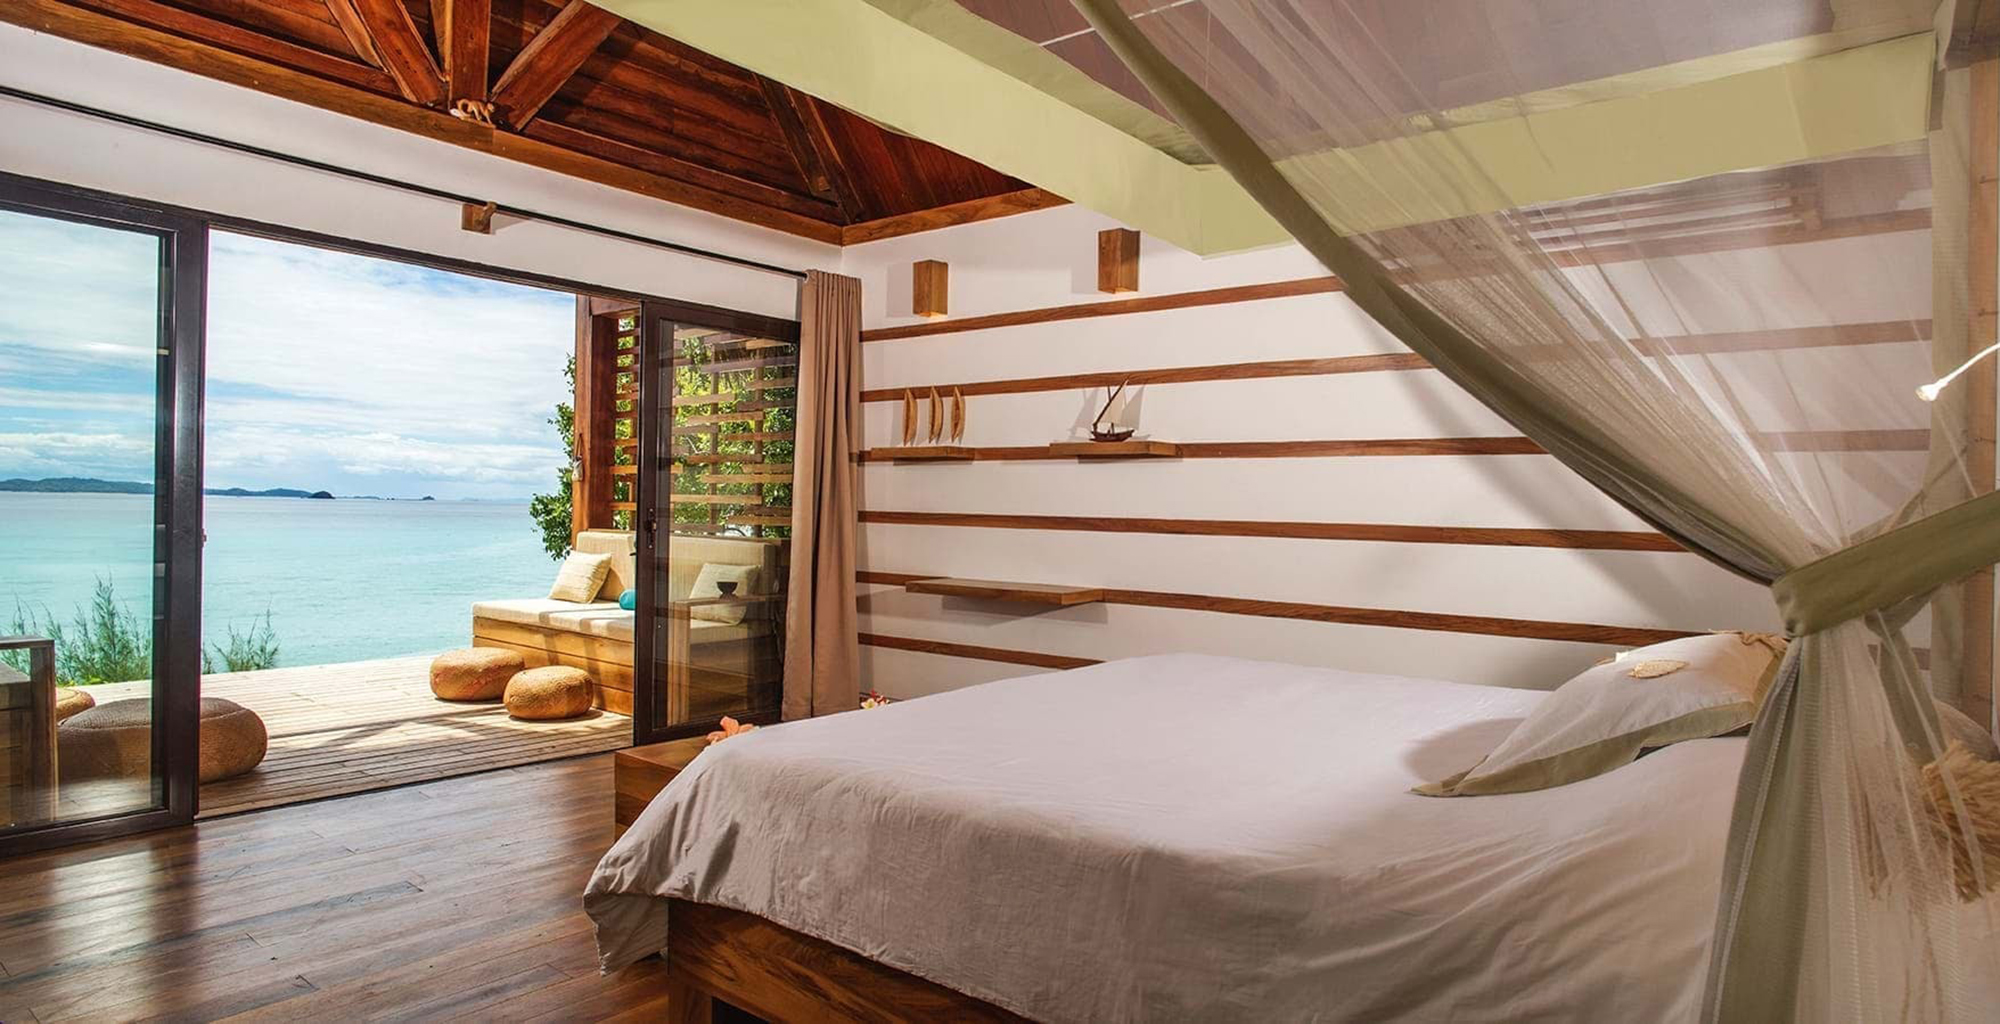 Madagascar-Constance-Tsarabanjina-Bedroom